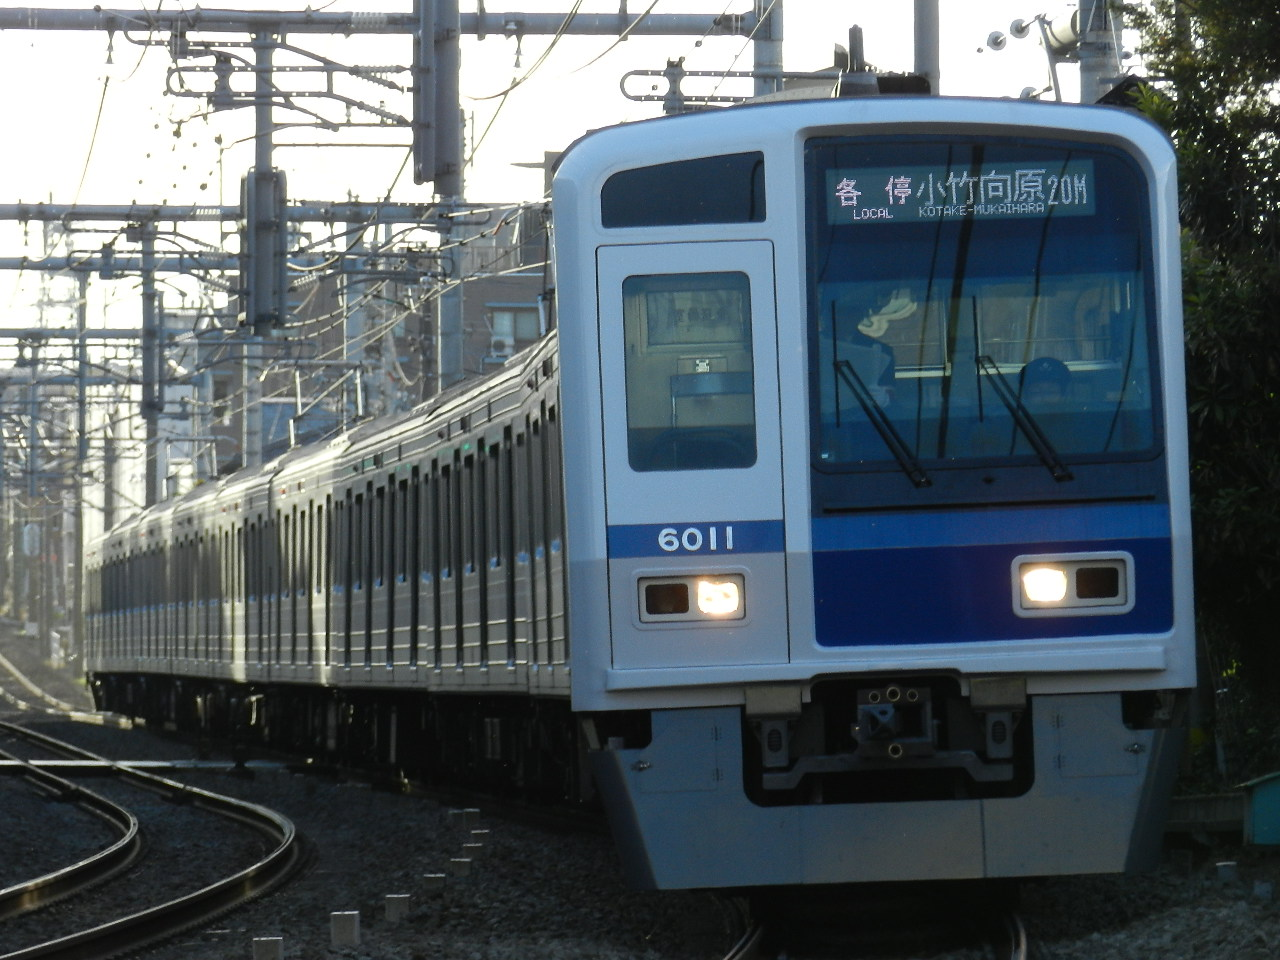 2012-11-04 081